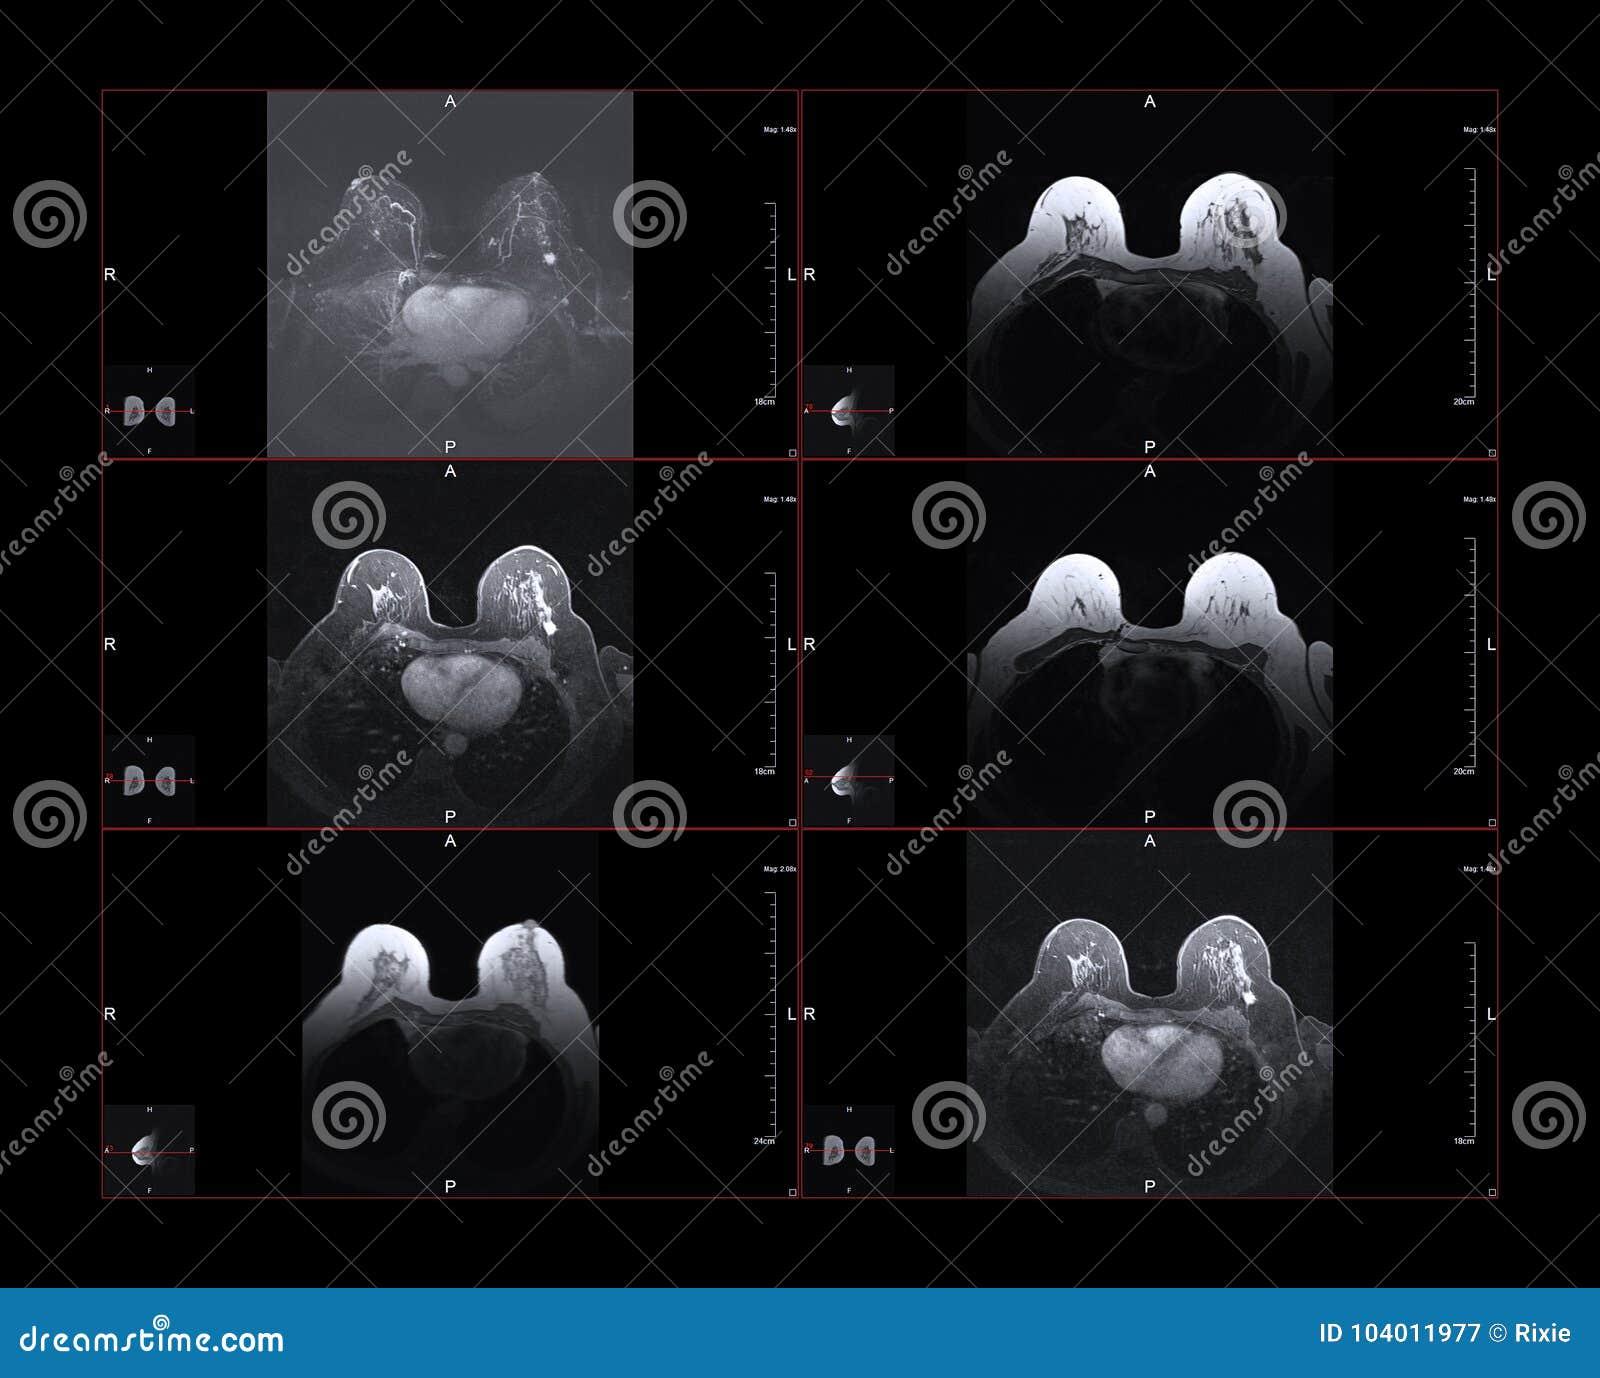 Cáncer de pecho MRI